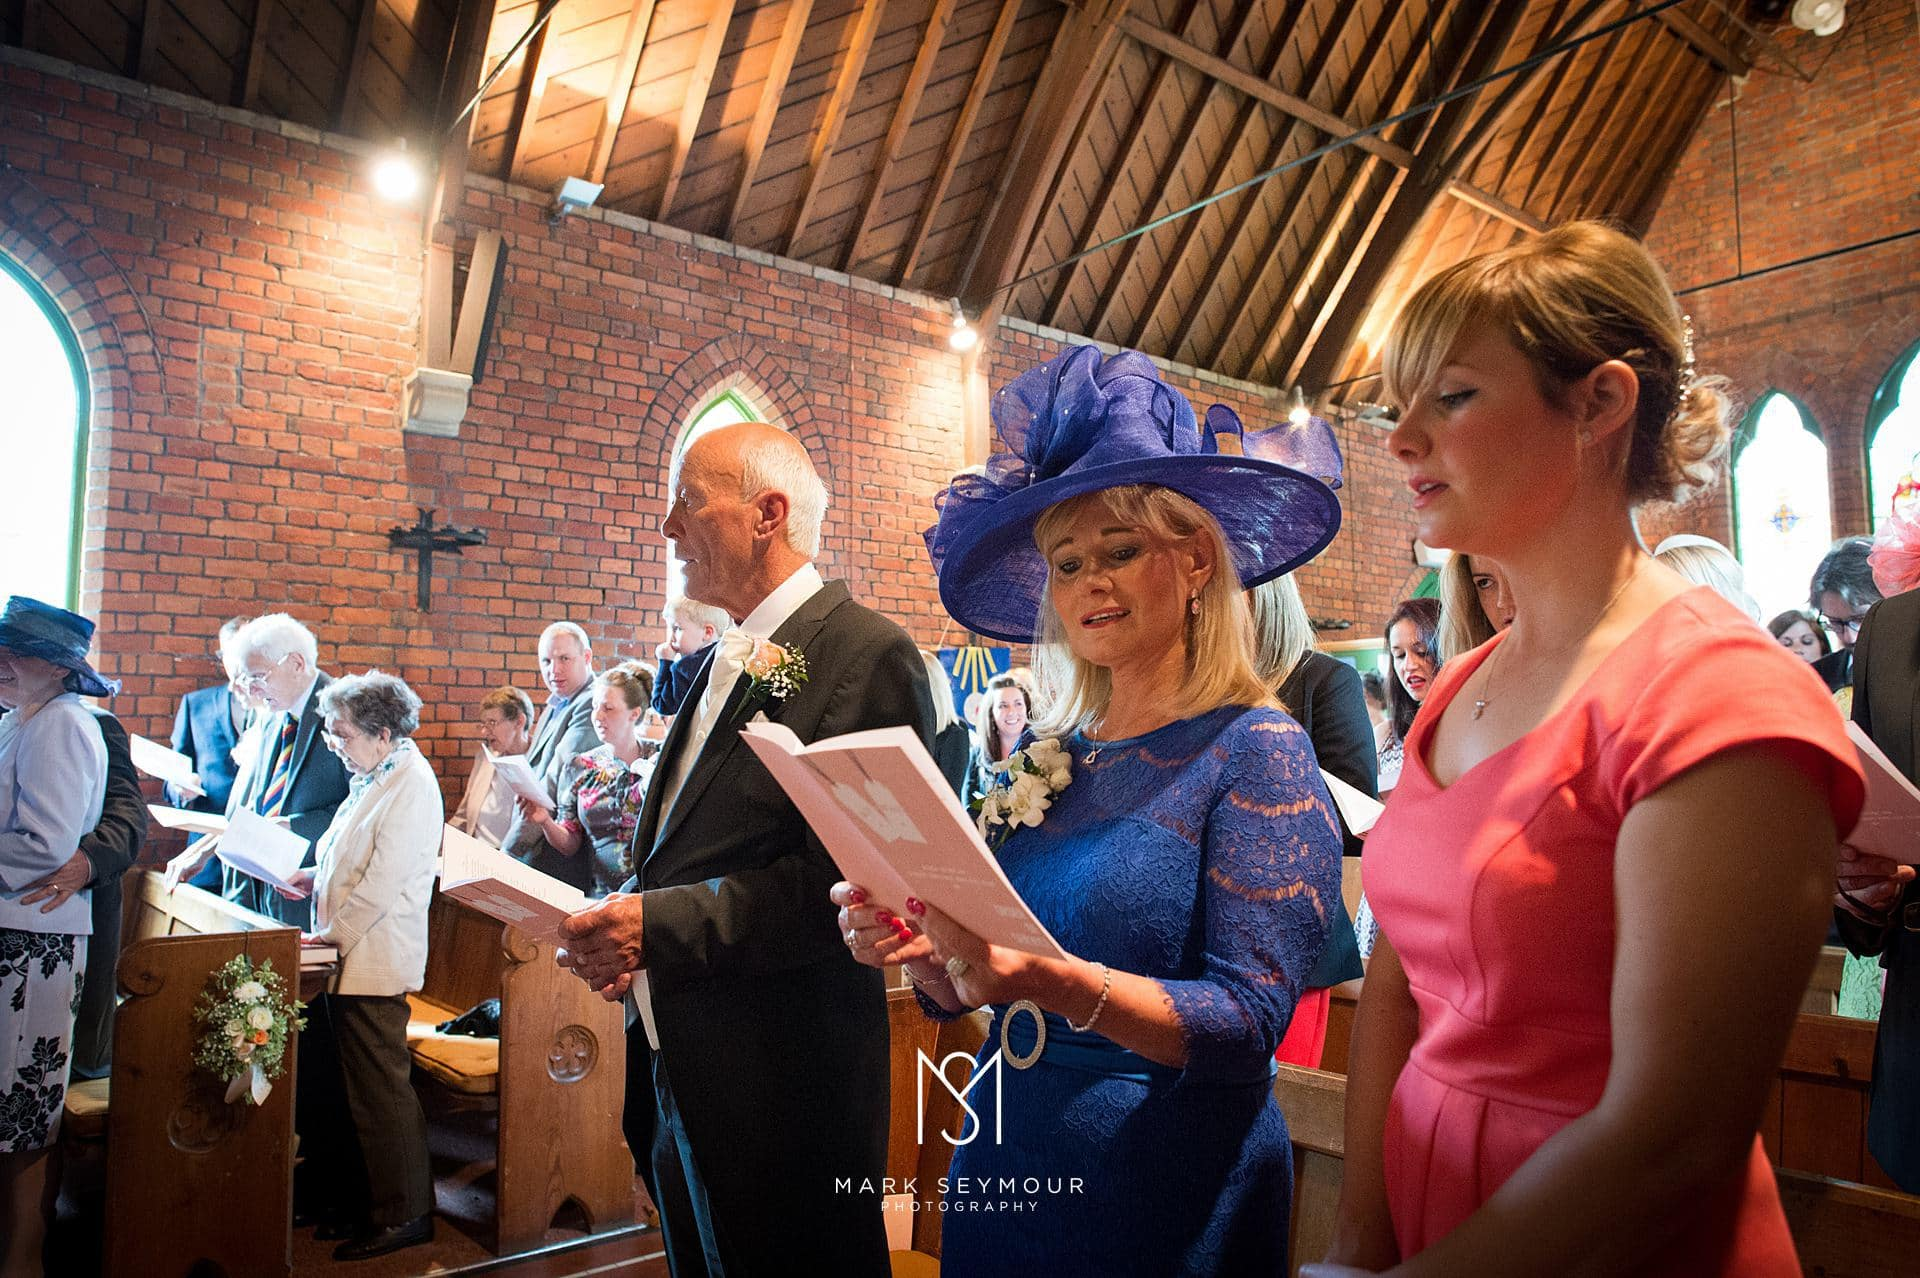 Singing at a church wedding